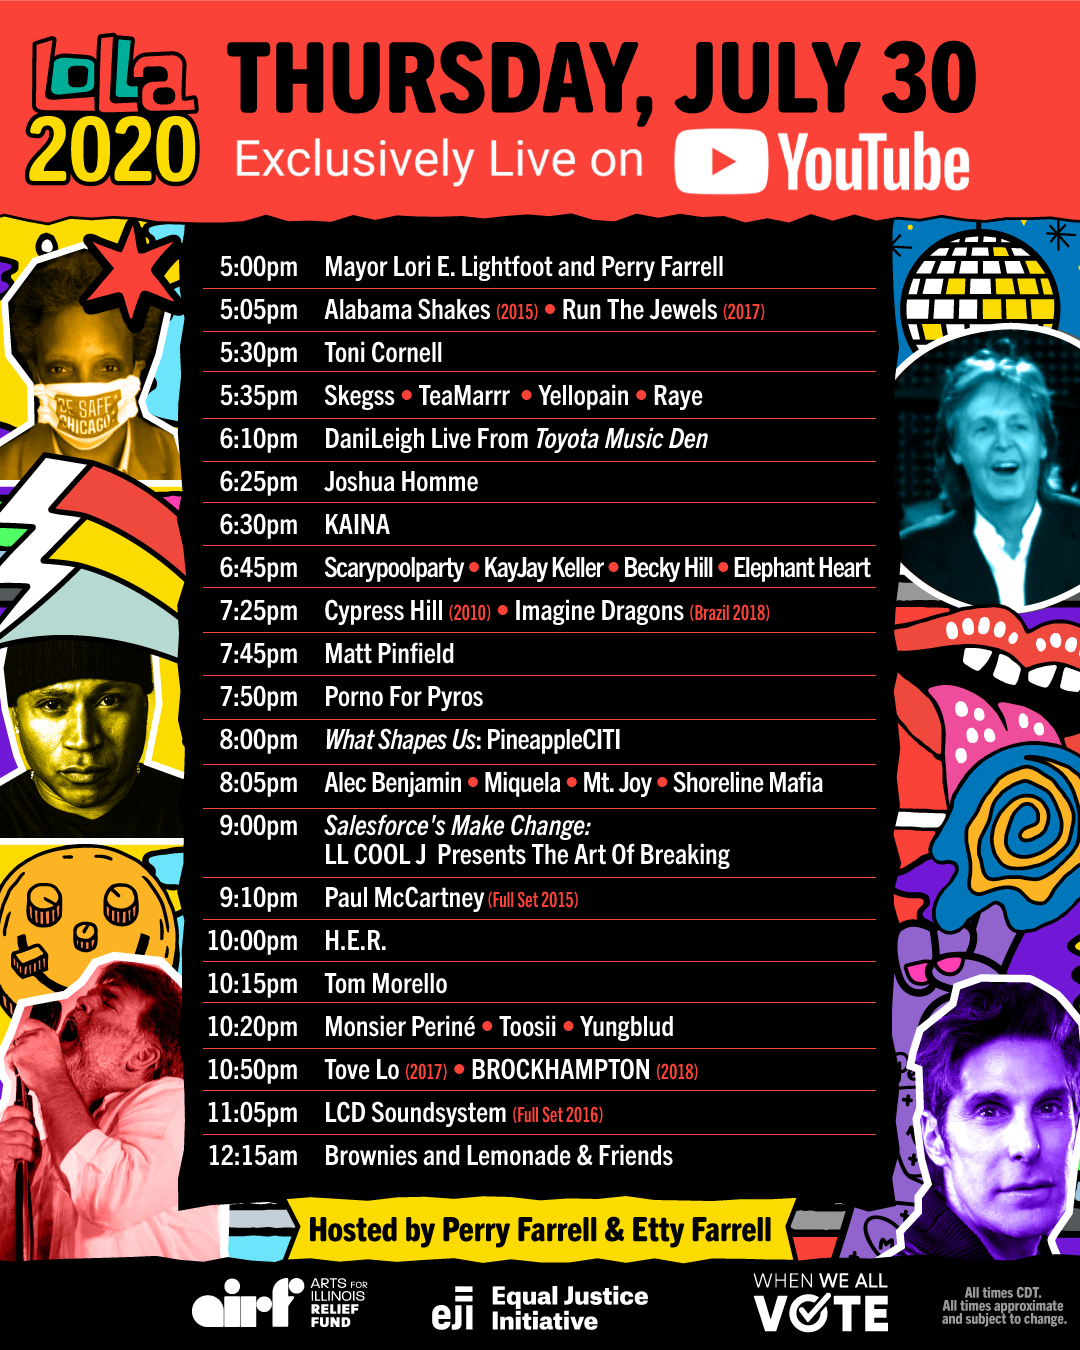 Lollapalooza 2020 Thursday